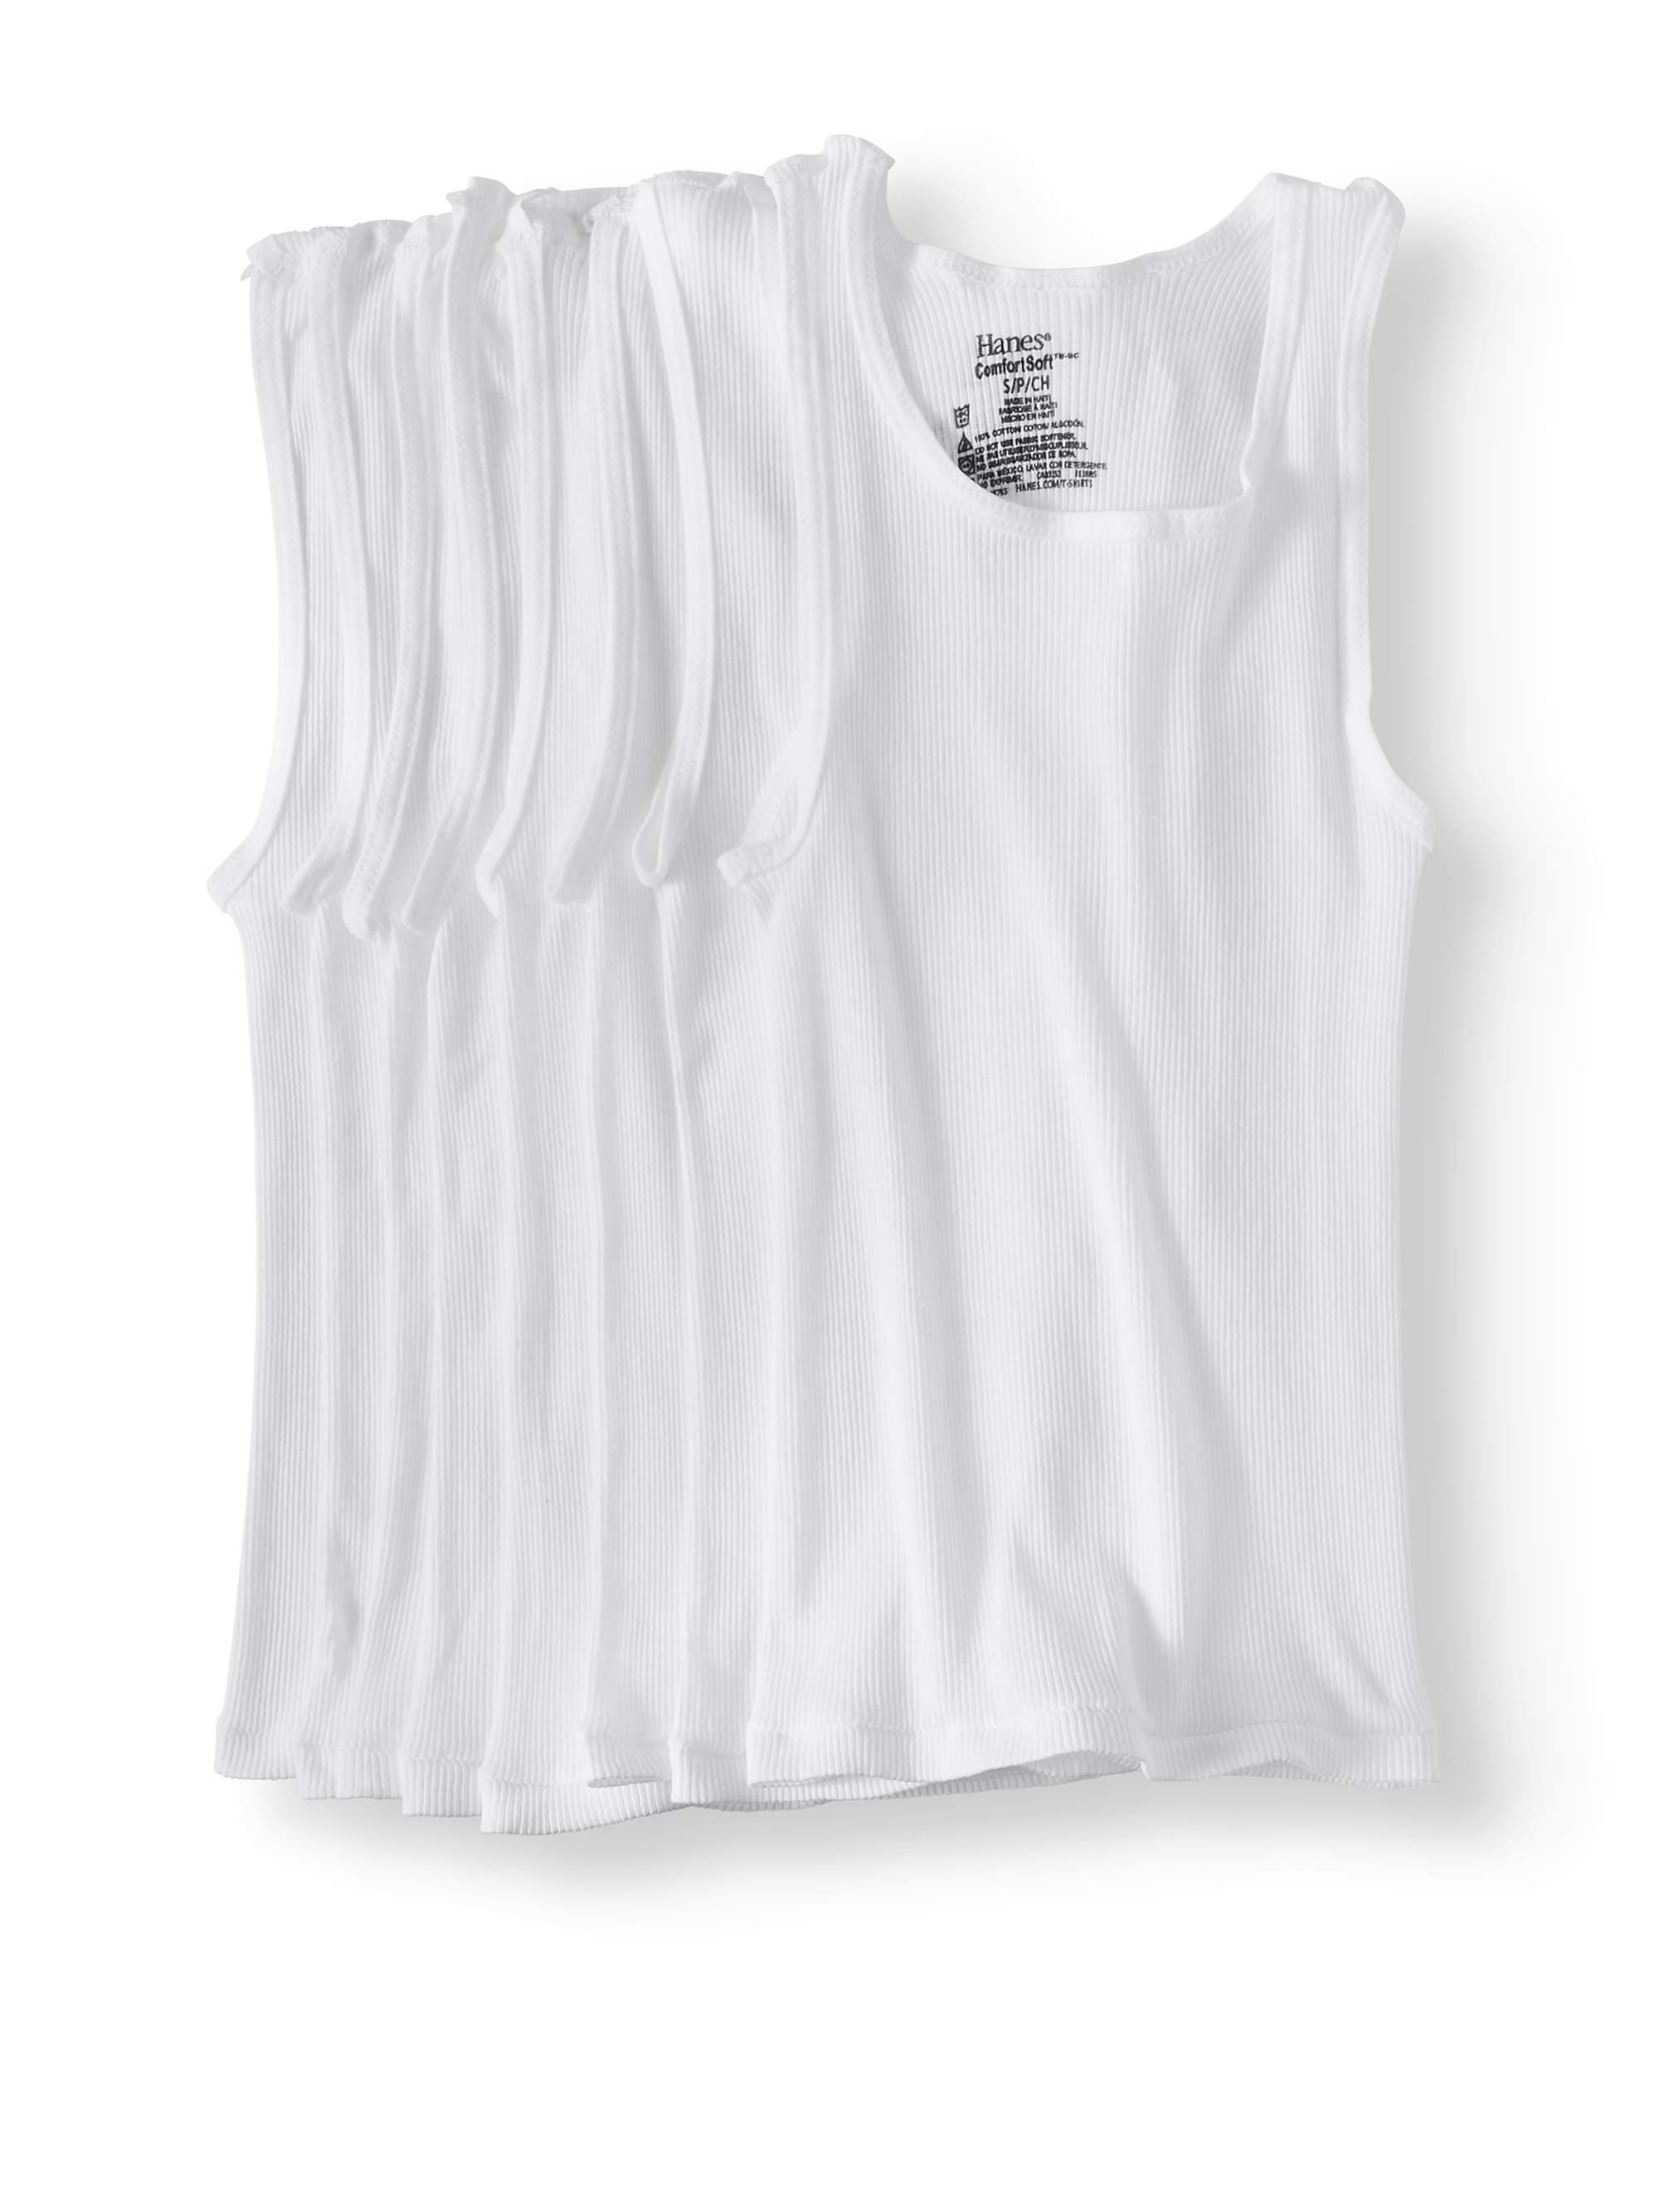 Boys' White Tagless Tank Shirt, 5 + 3 Pack